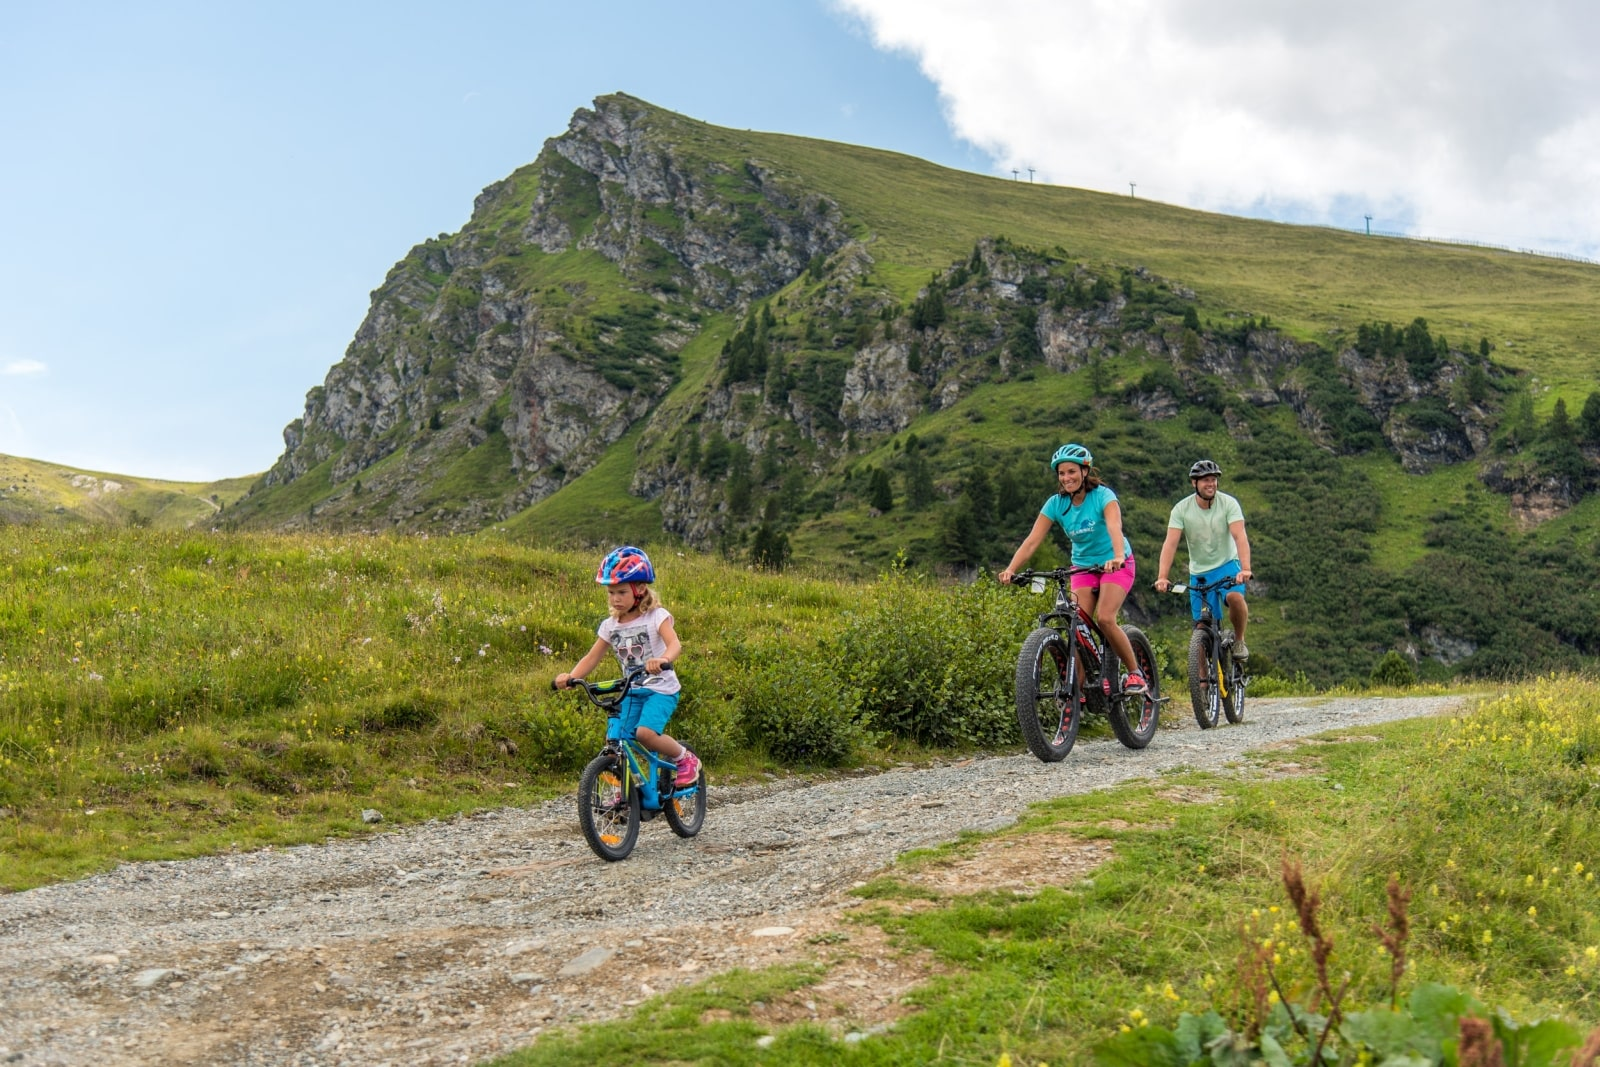 Heidi-Chalet-Falkert-Heidialm-Natur-See-Biken-Fahrrad-Kinder-Zirbenhuette-Weg